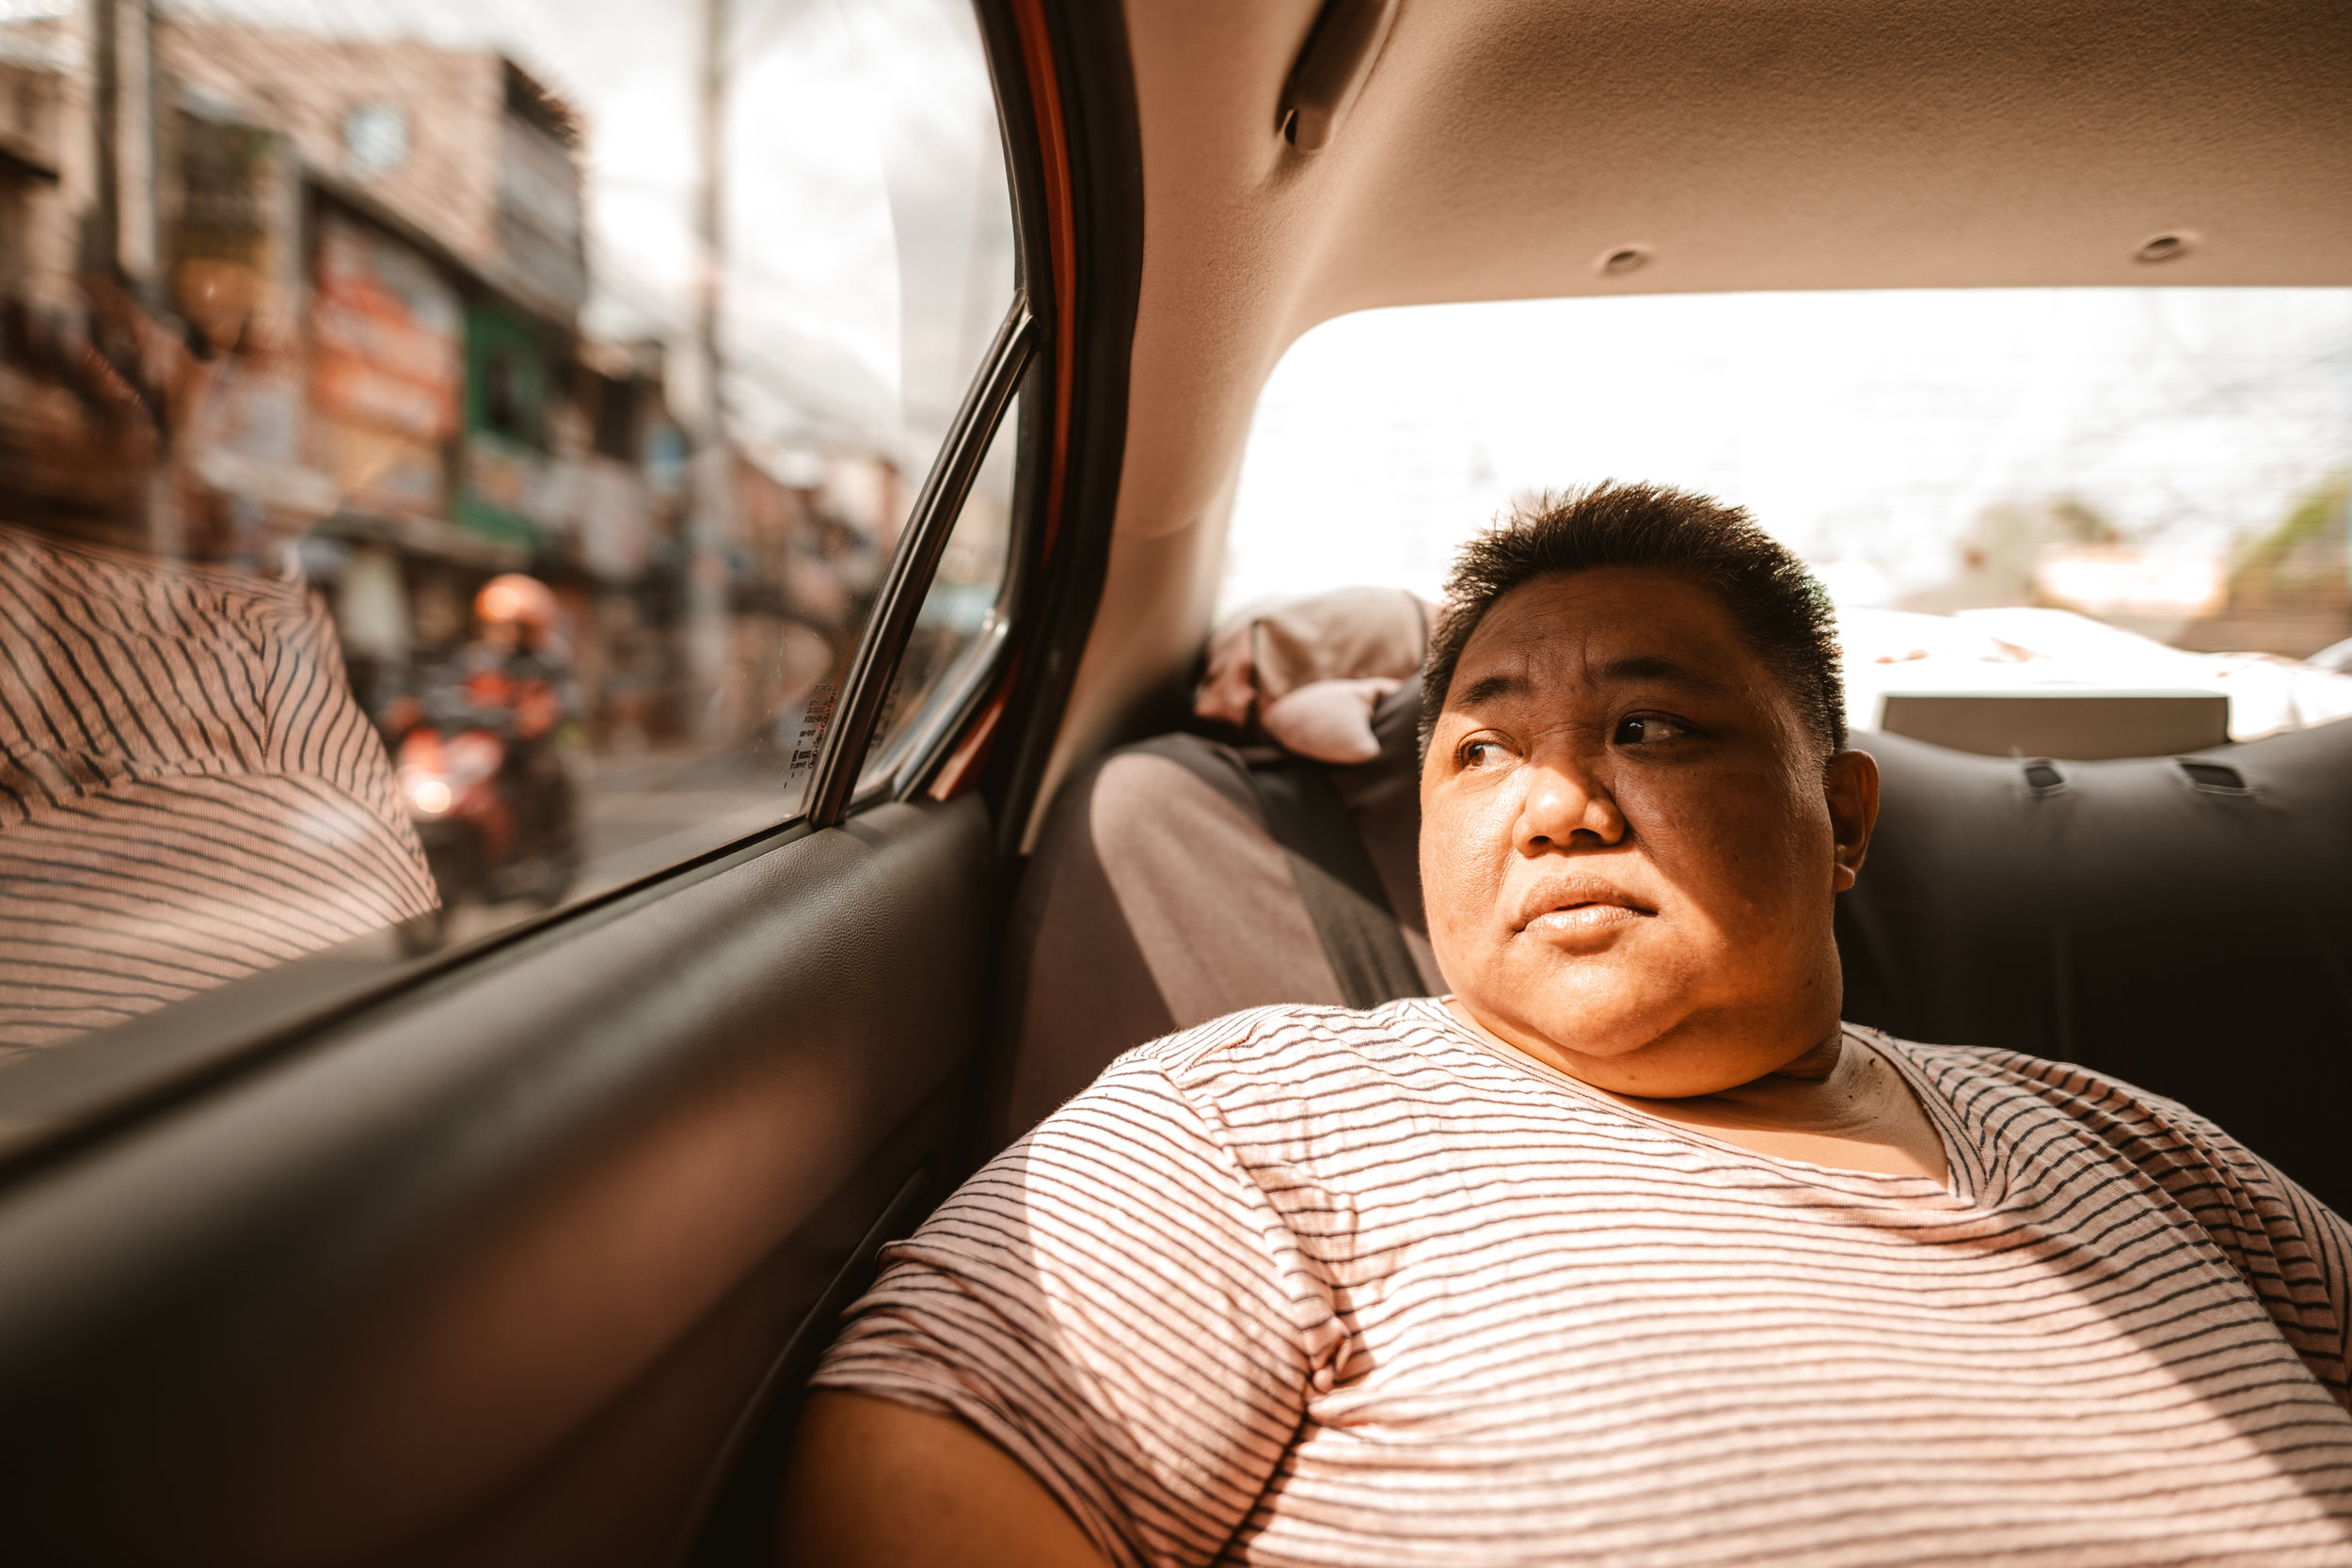 ProjectDjuna_MANILA_PHILIPPINES_AdelineDumapong-731725.jpg